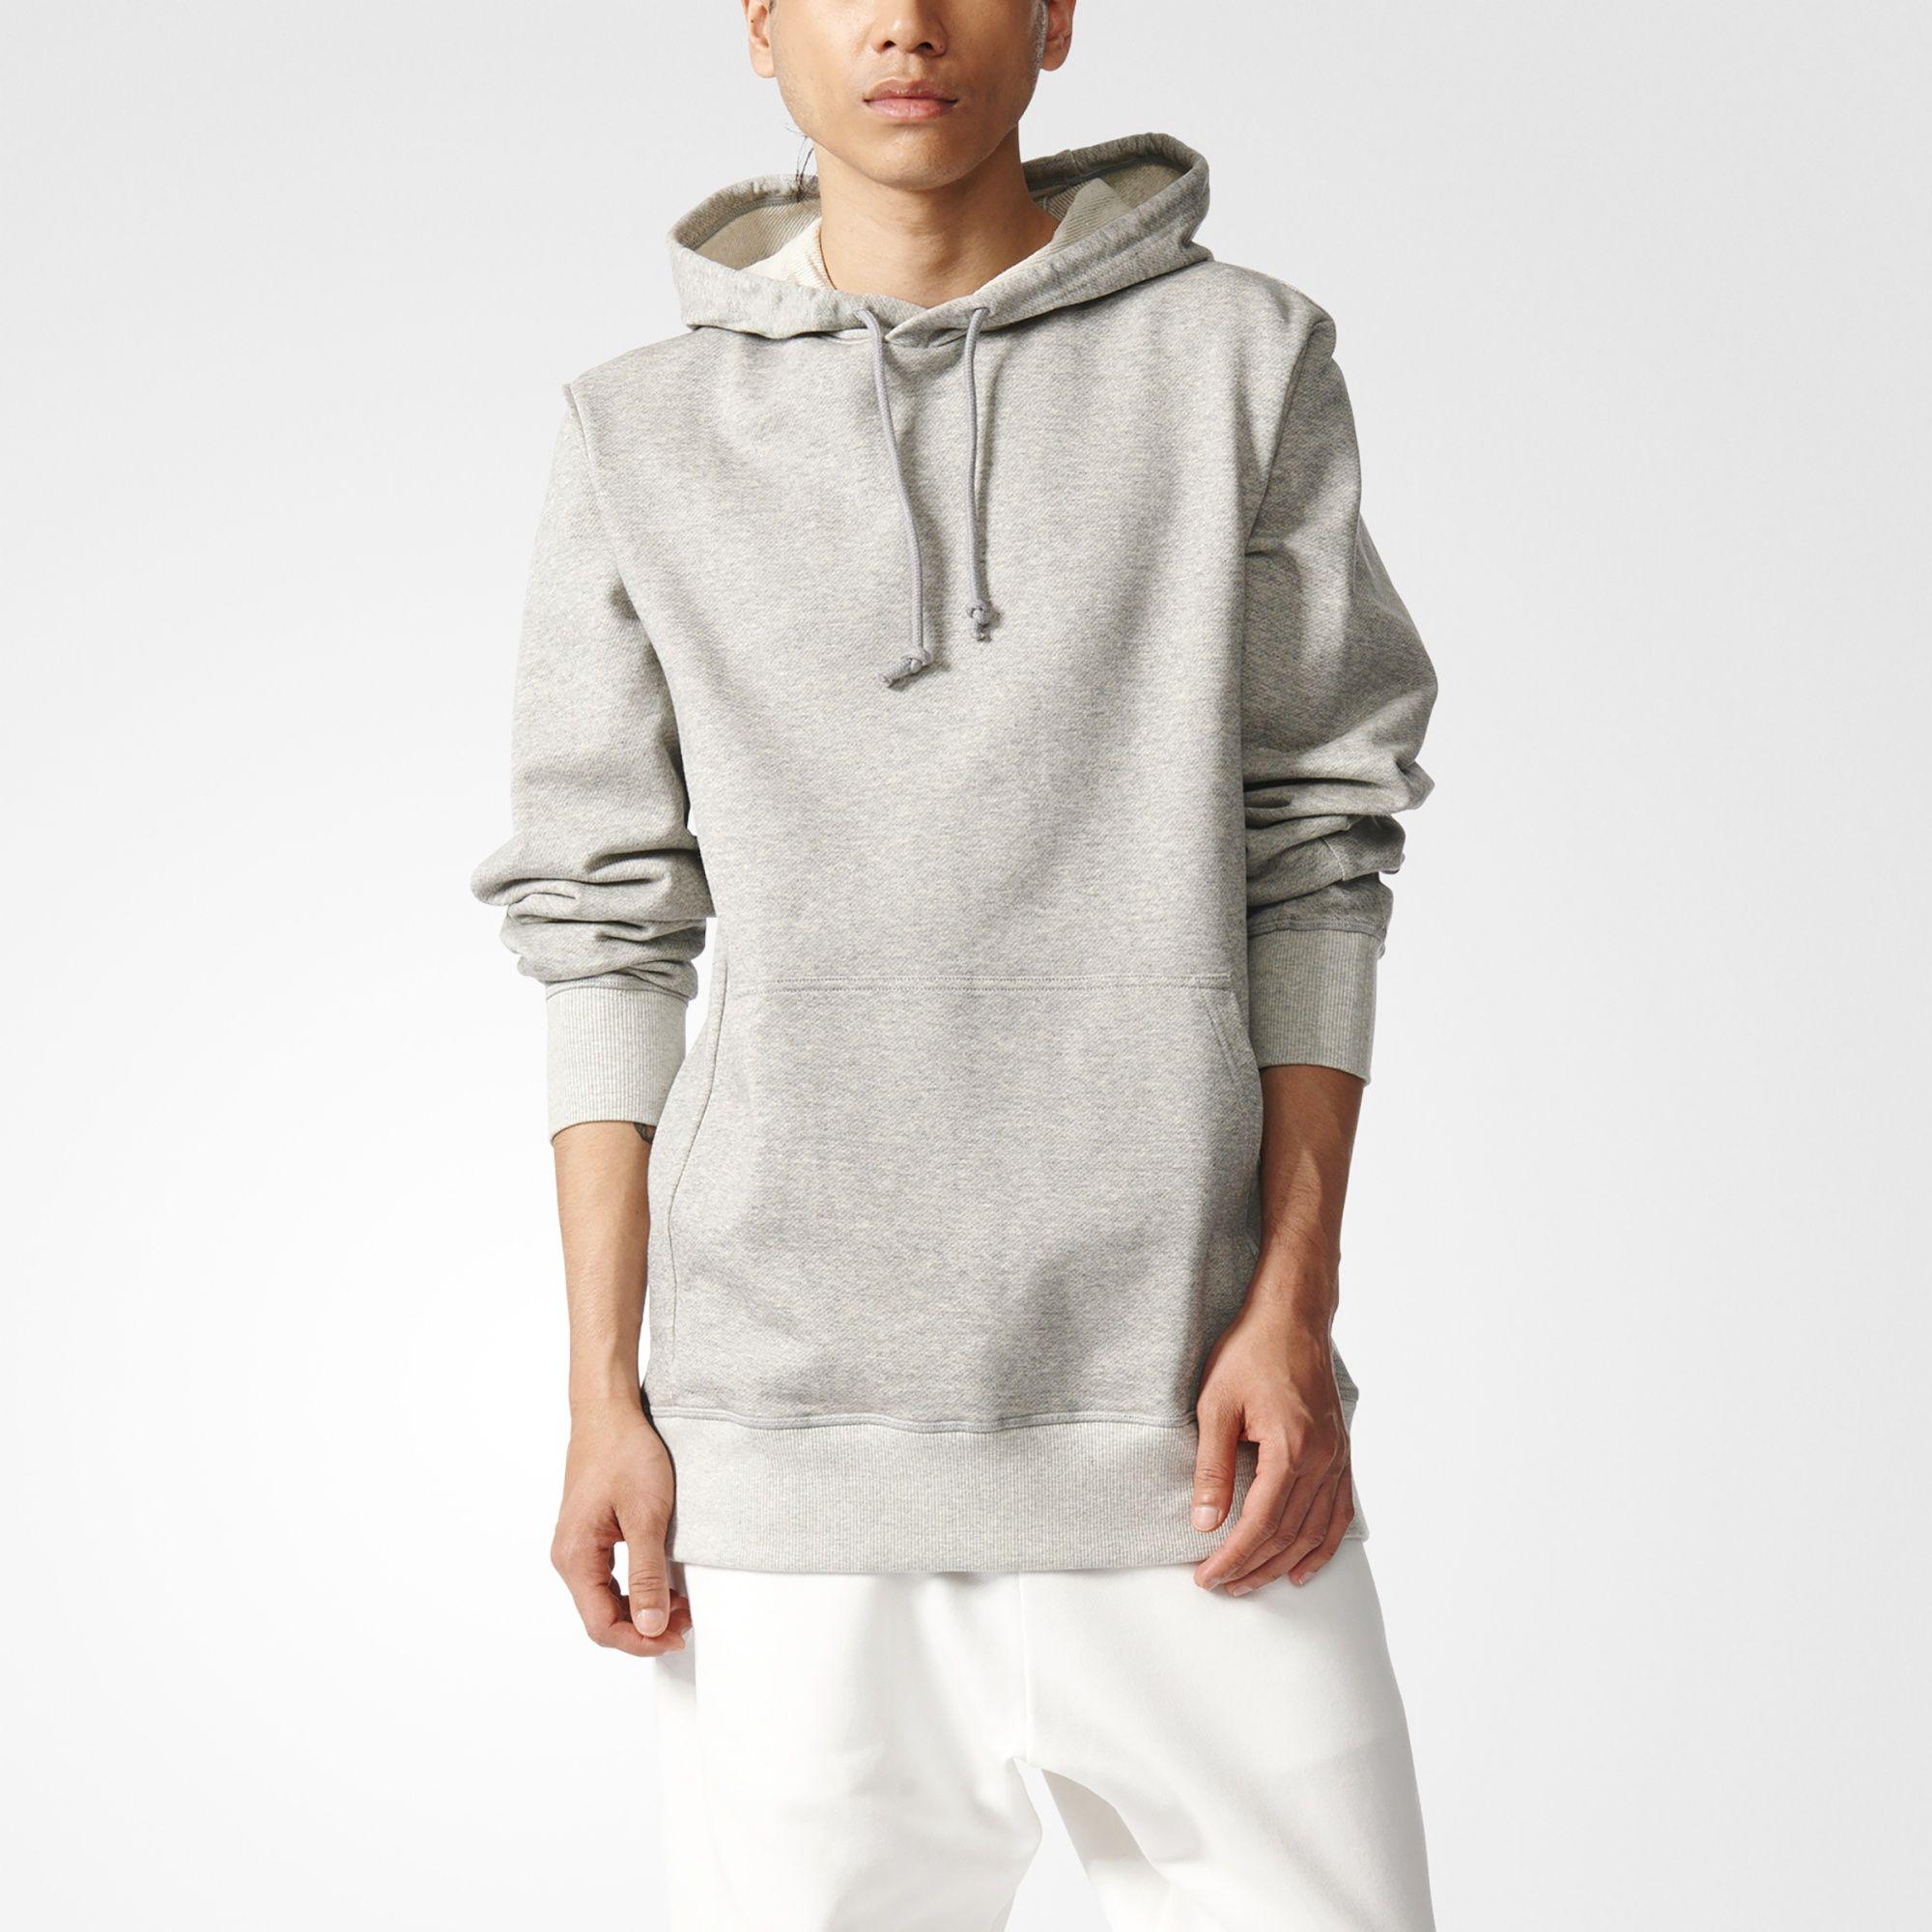 Pullover, Hoodie, Adidas Originals, Gray, Colour, Shops, Gentleman Moderne, Online  Shopping, Men s Fashion cb80cffffd